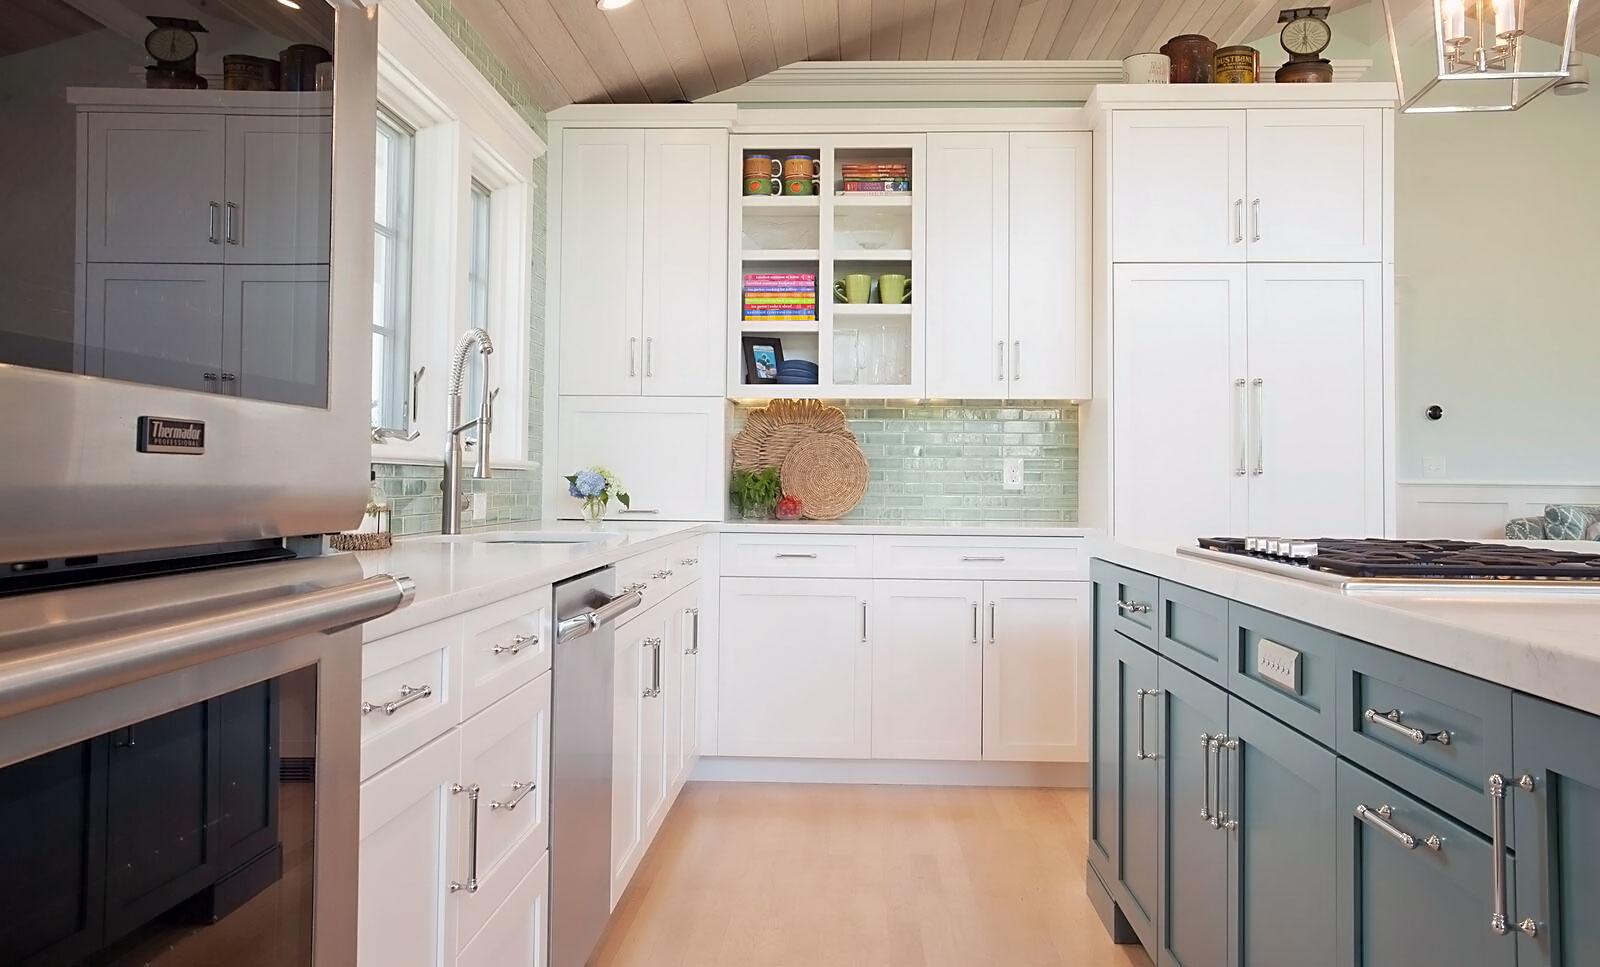 Stephen-Sullivan-Inc-Custom-Home-Builders-Rhode-Island-Narrow-River-Cottage---12